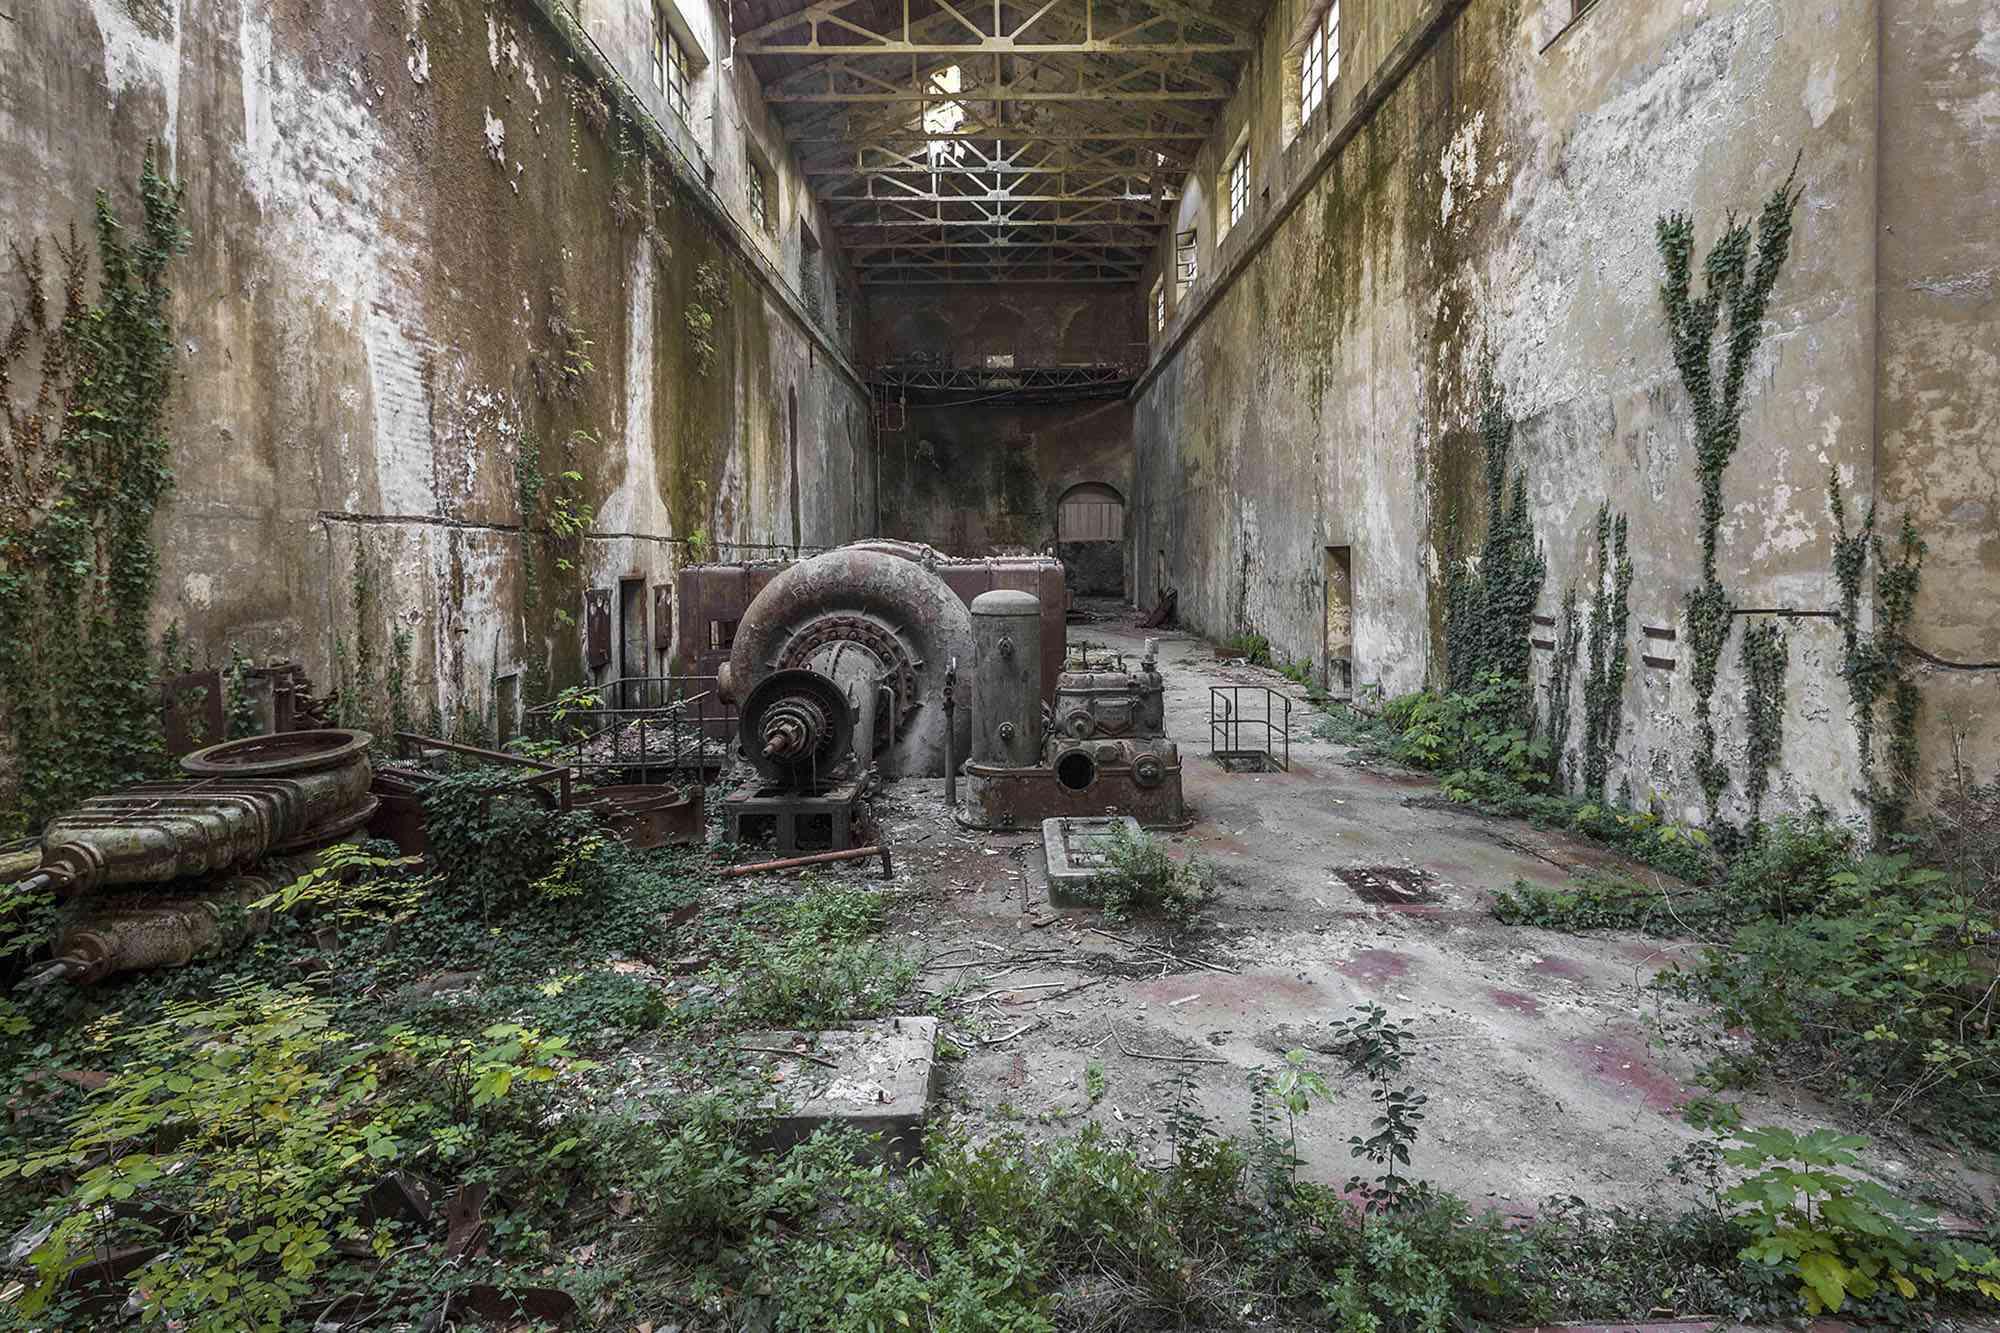 Naturalia II photographs of nature reclaiming abandoned sites Jonk